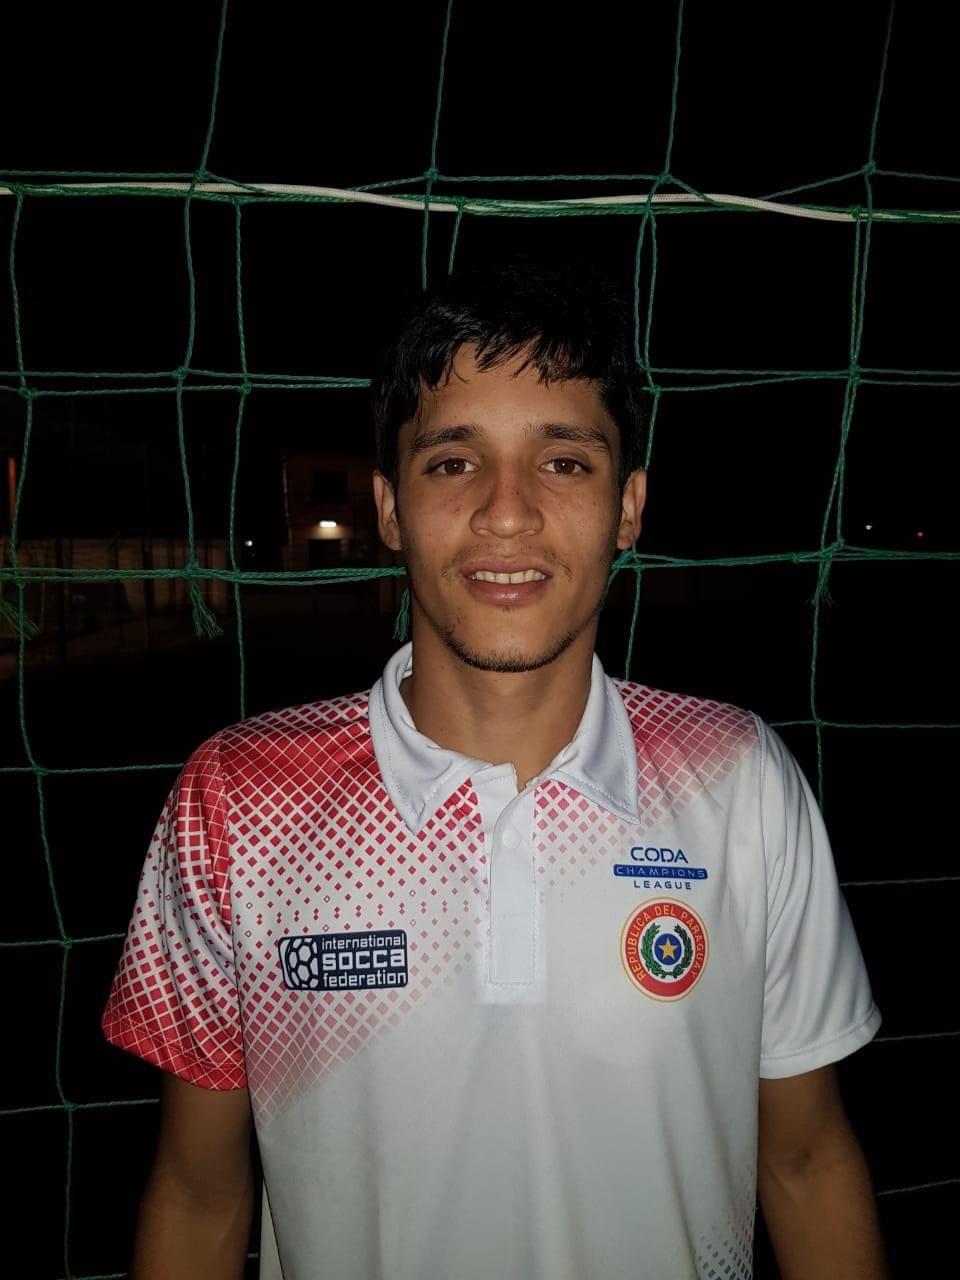 Carlos Alberto Dominguez Benitez